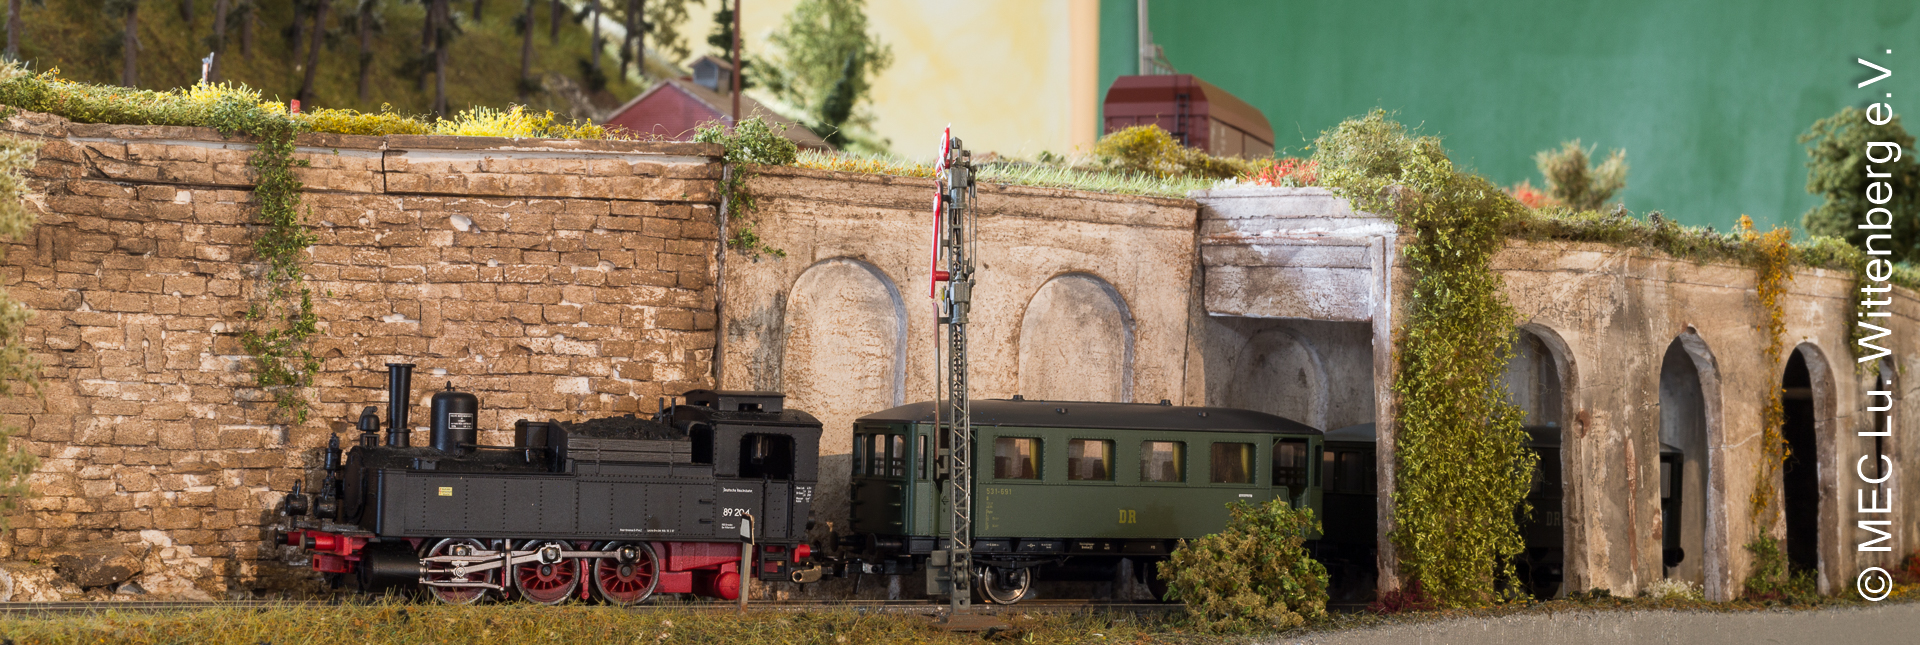 Kompaktanlage Sachsen/Windbergbahn #2